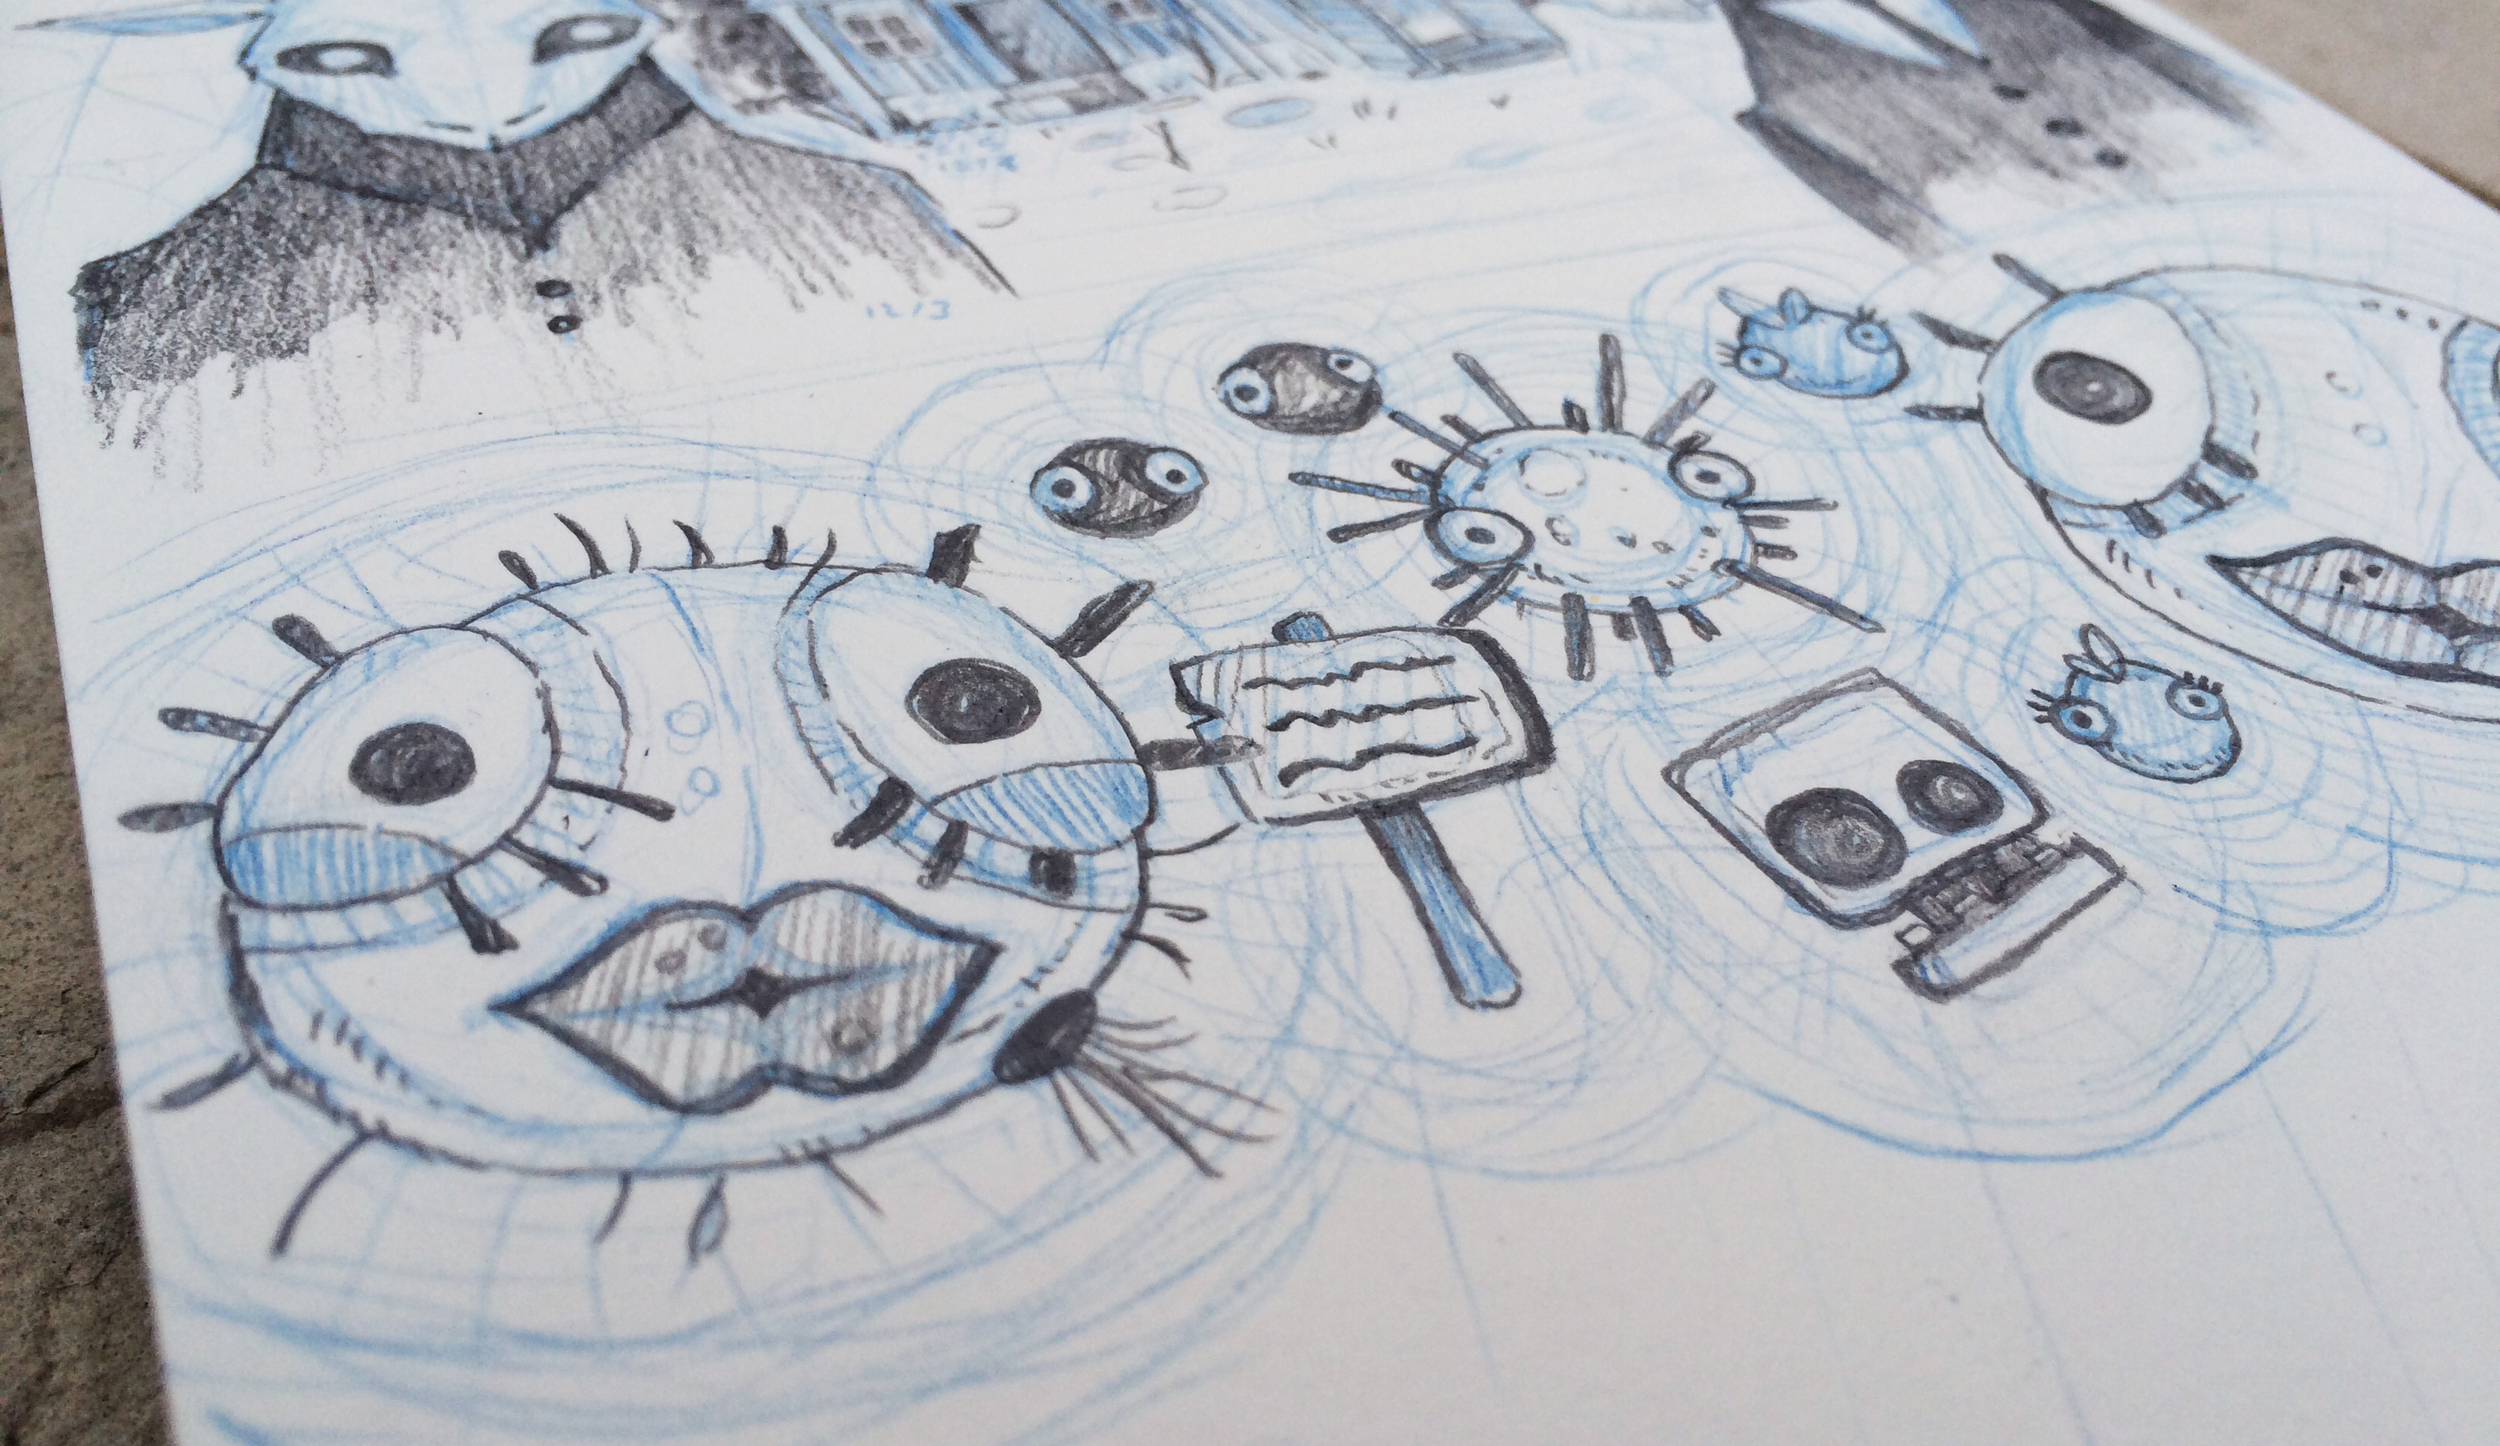 Sketch of World of Goo by Chloe Yingst | chloedraws.com